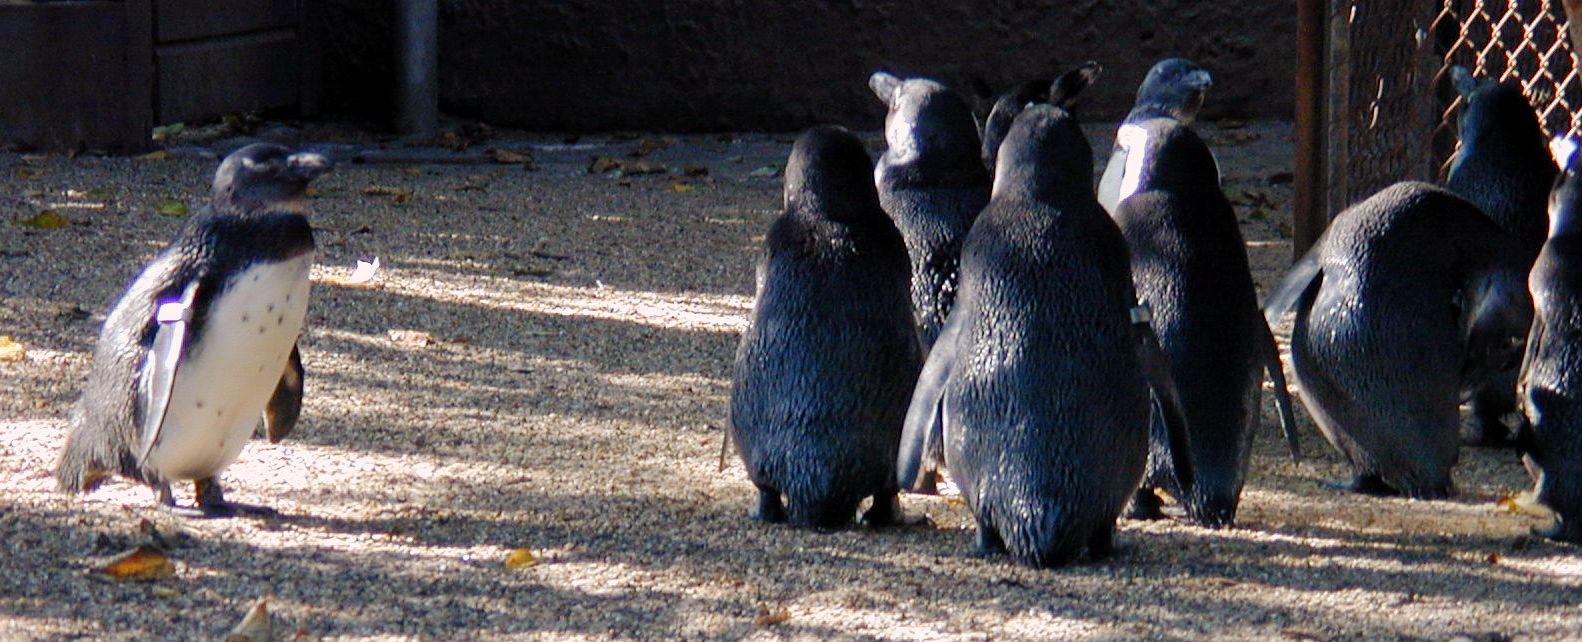 penguins group waiters together black white